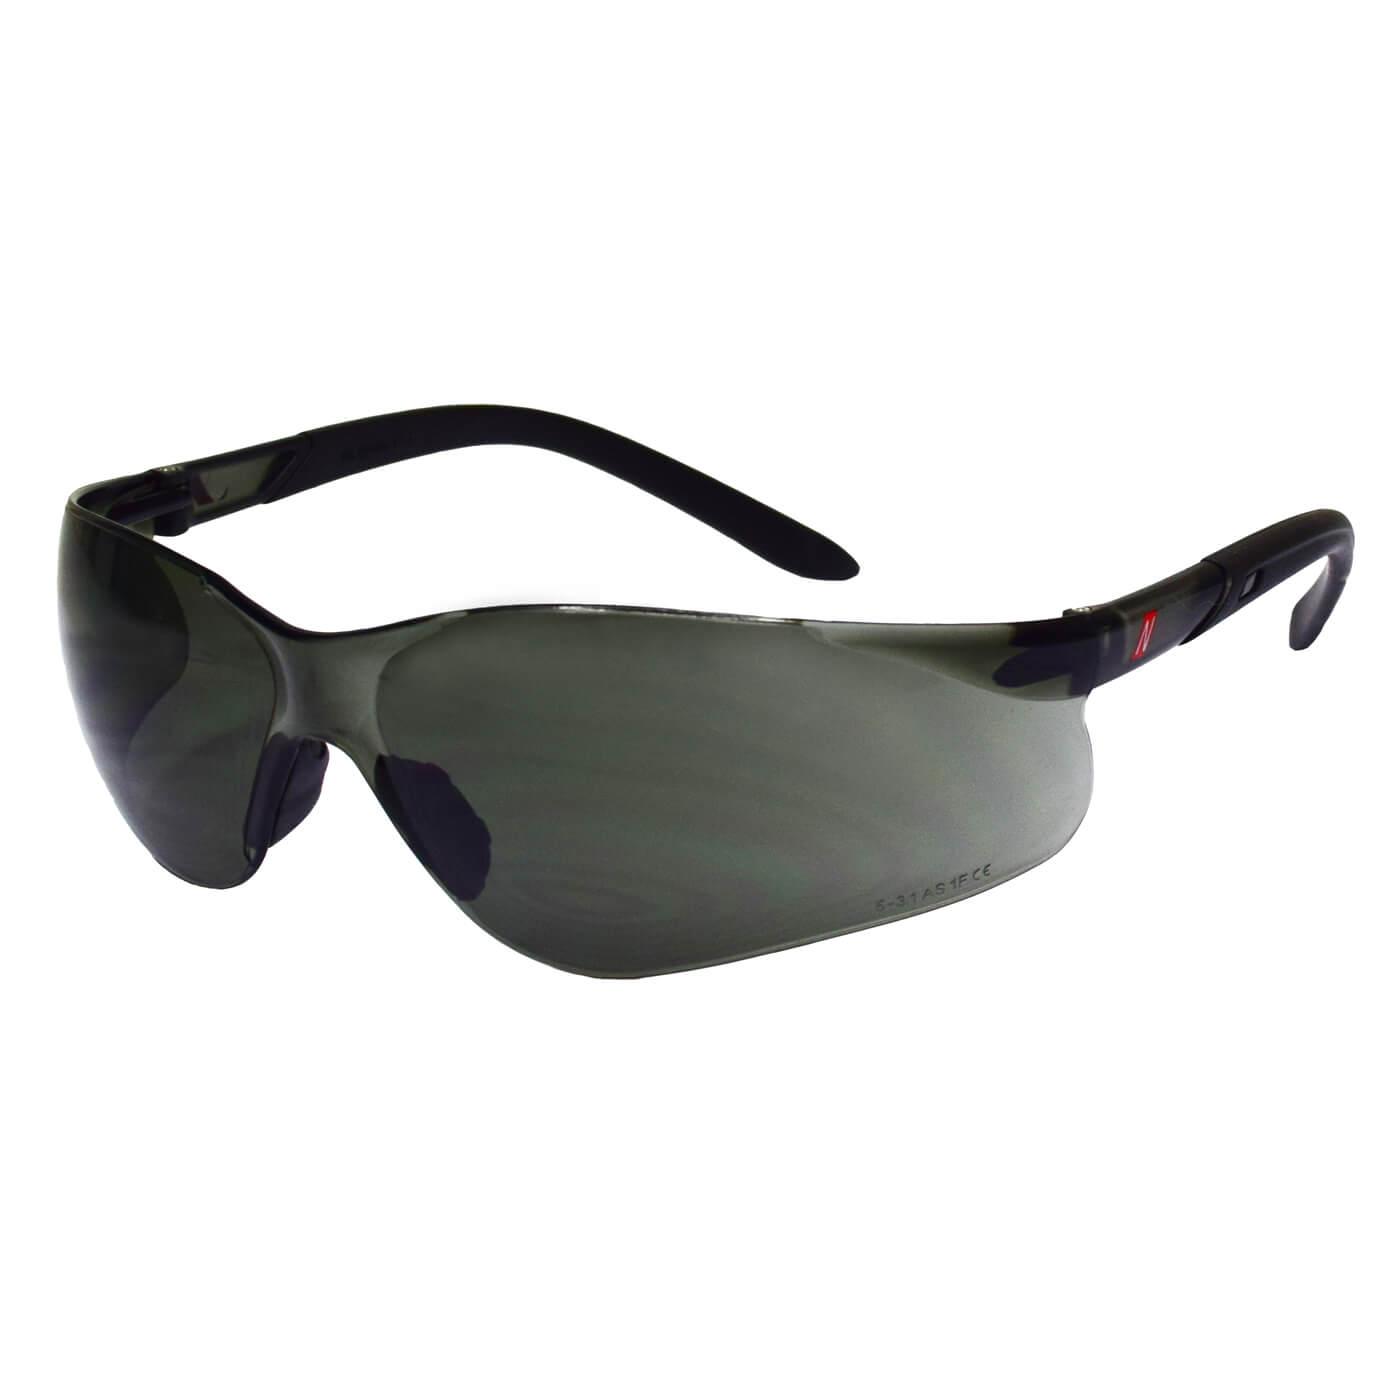 Okulary ochronne Nitras Vision Protect 9011